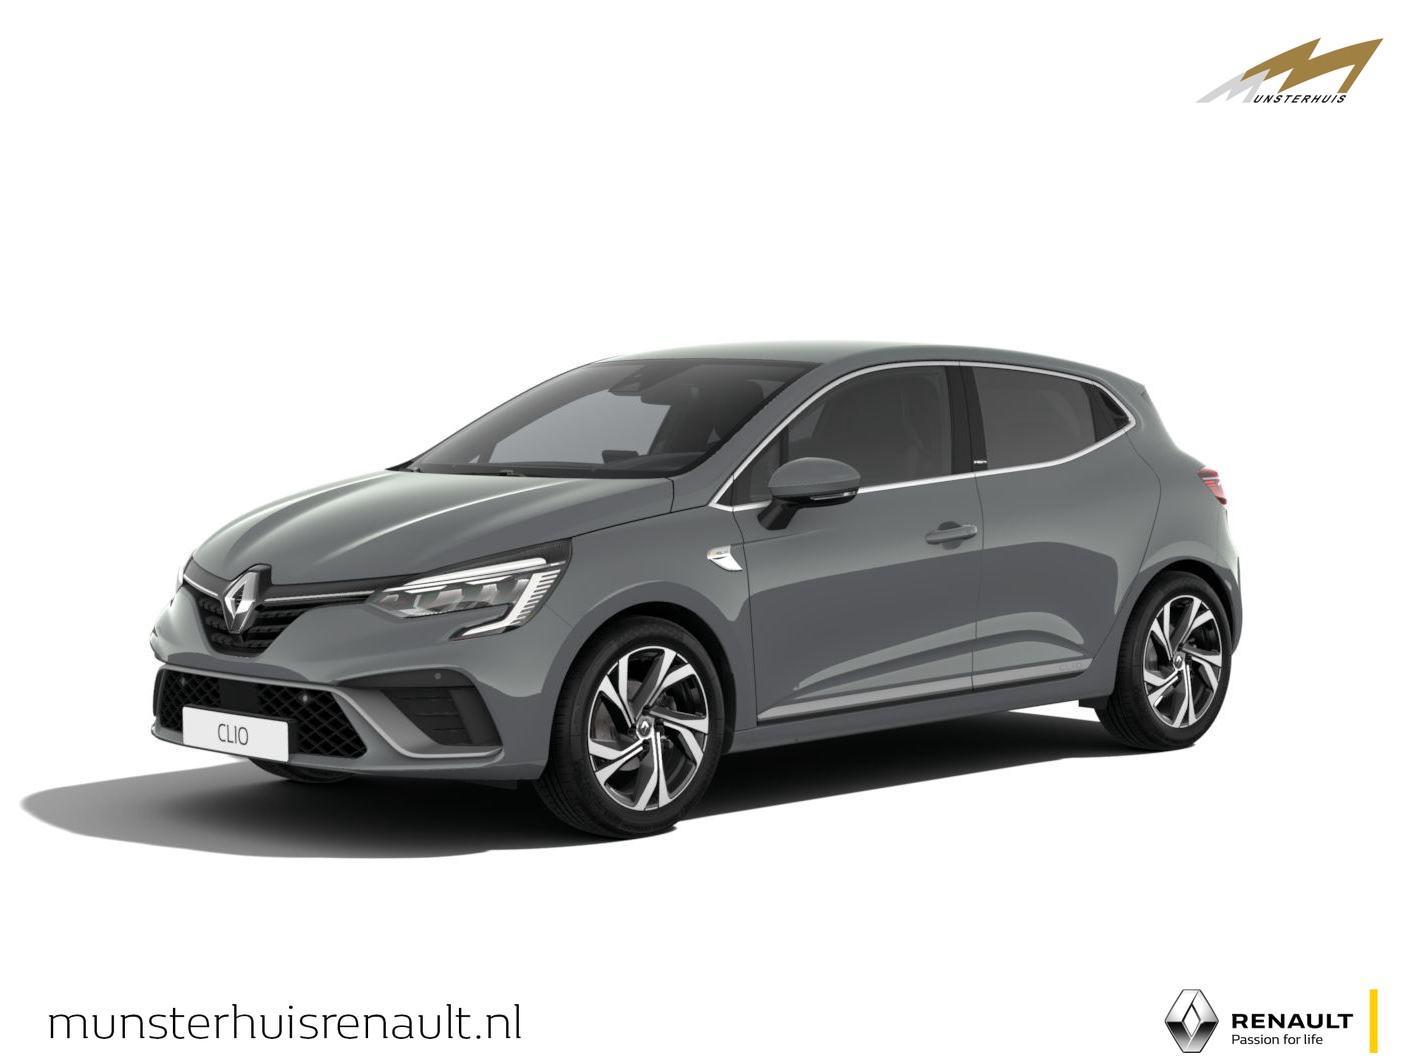 Renault Clio Hybrid 140 r.s. line - nieuw - hybride - wordt verwacht !